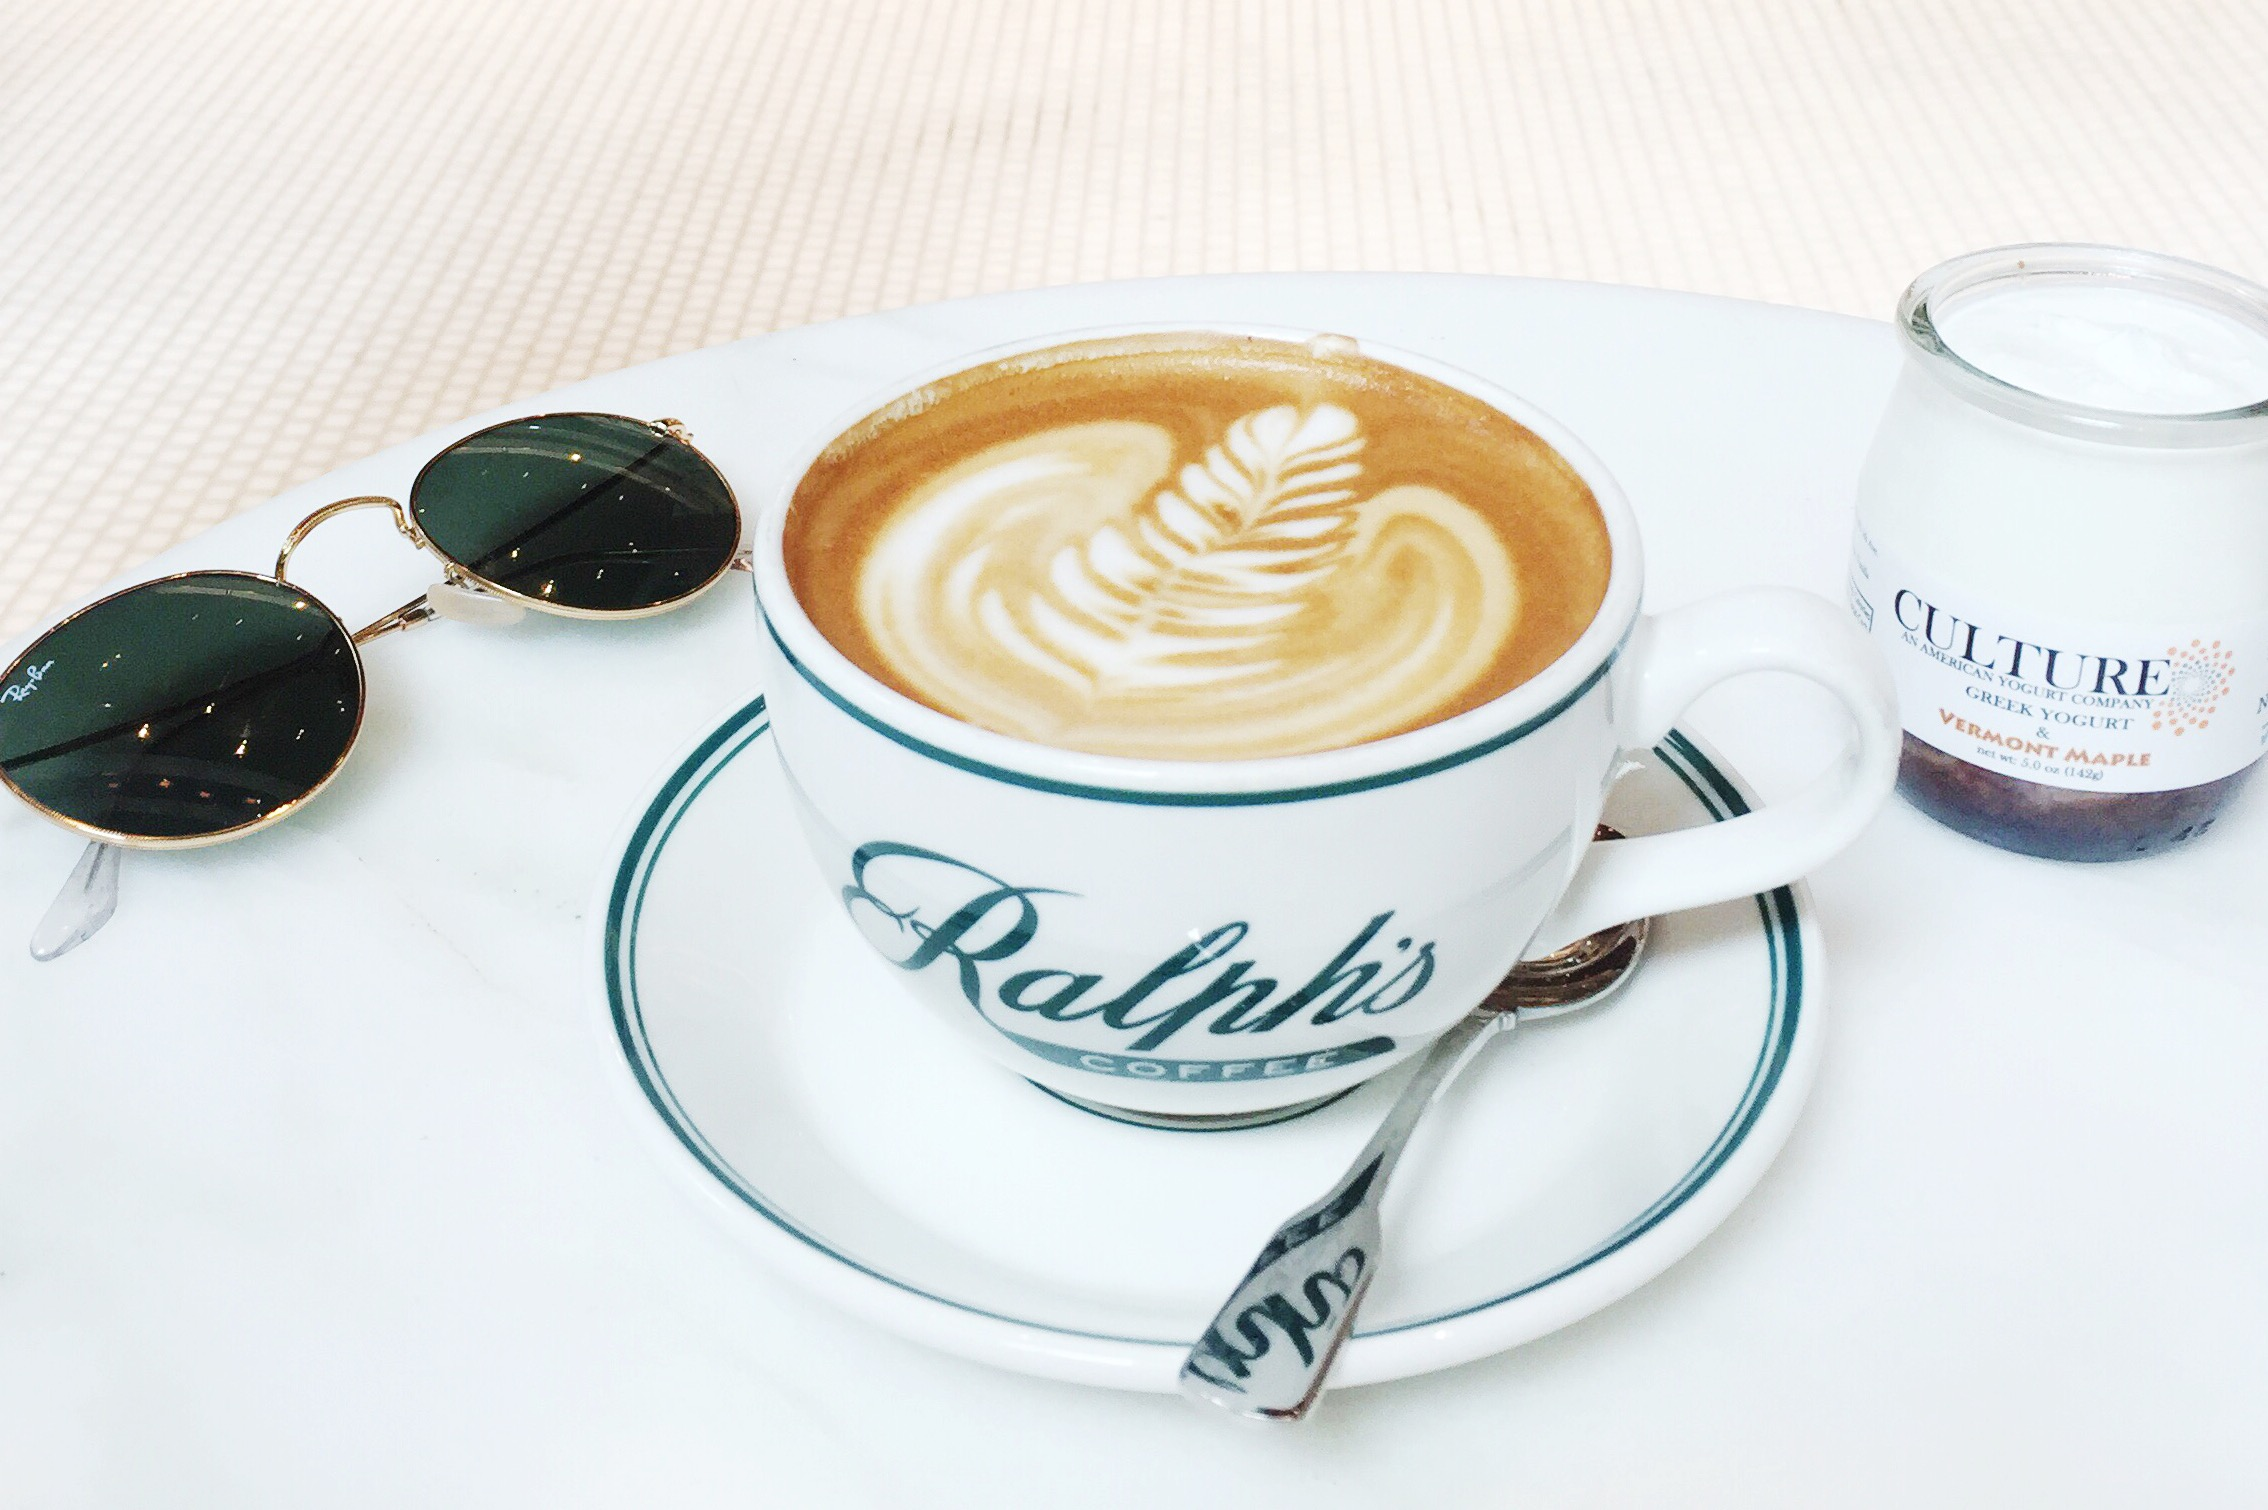 Erie Nick nyfw ralphs coffee